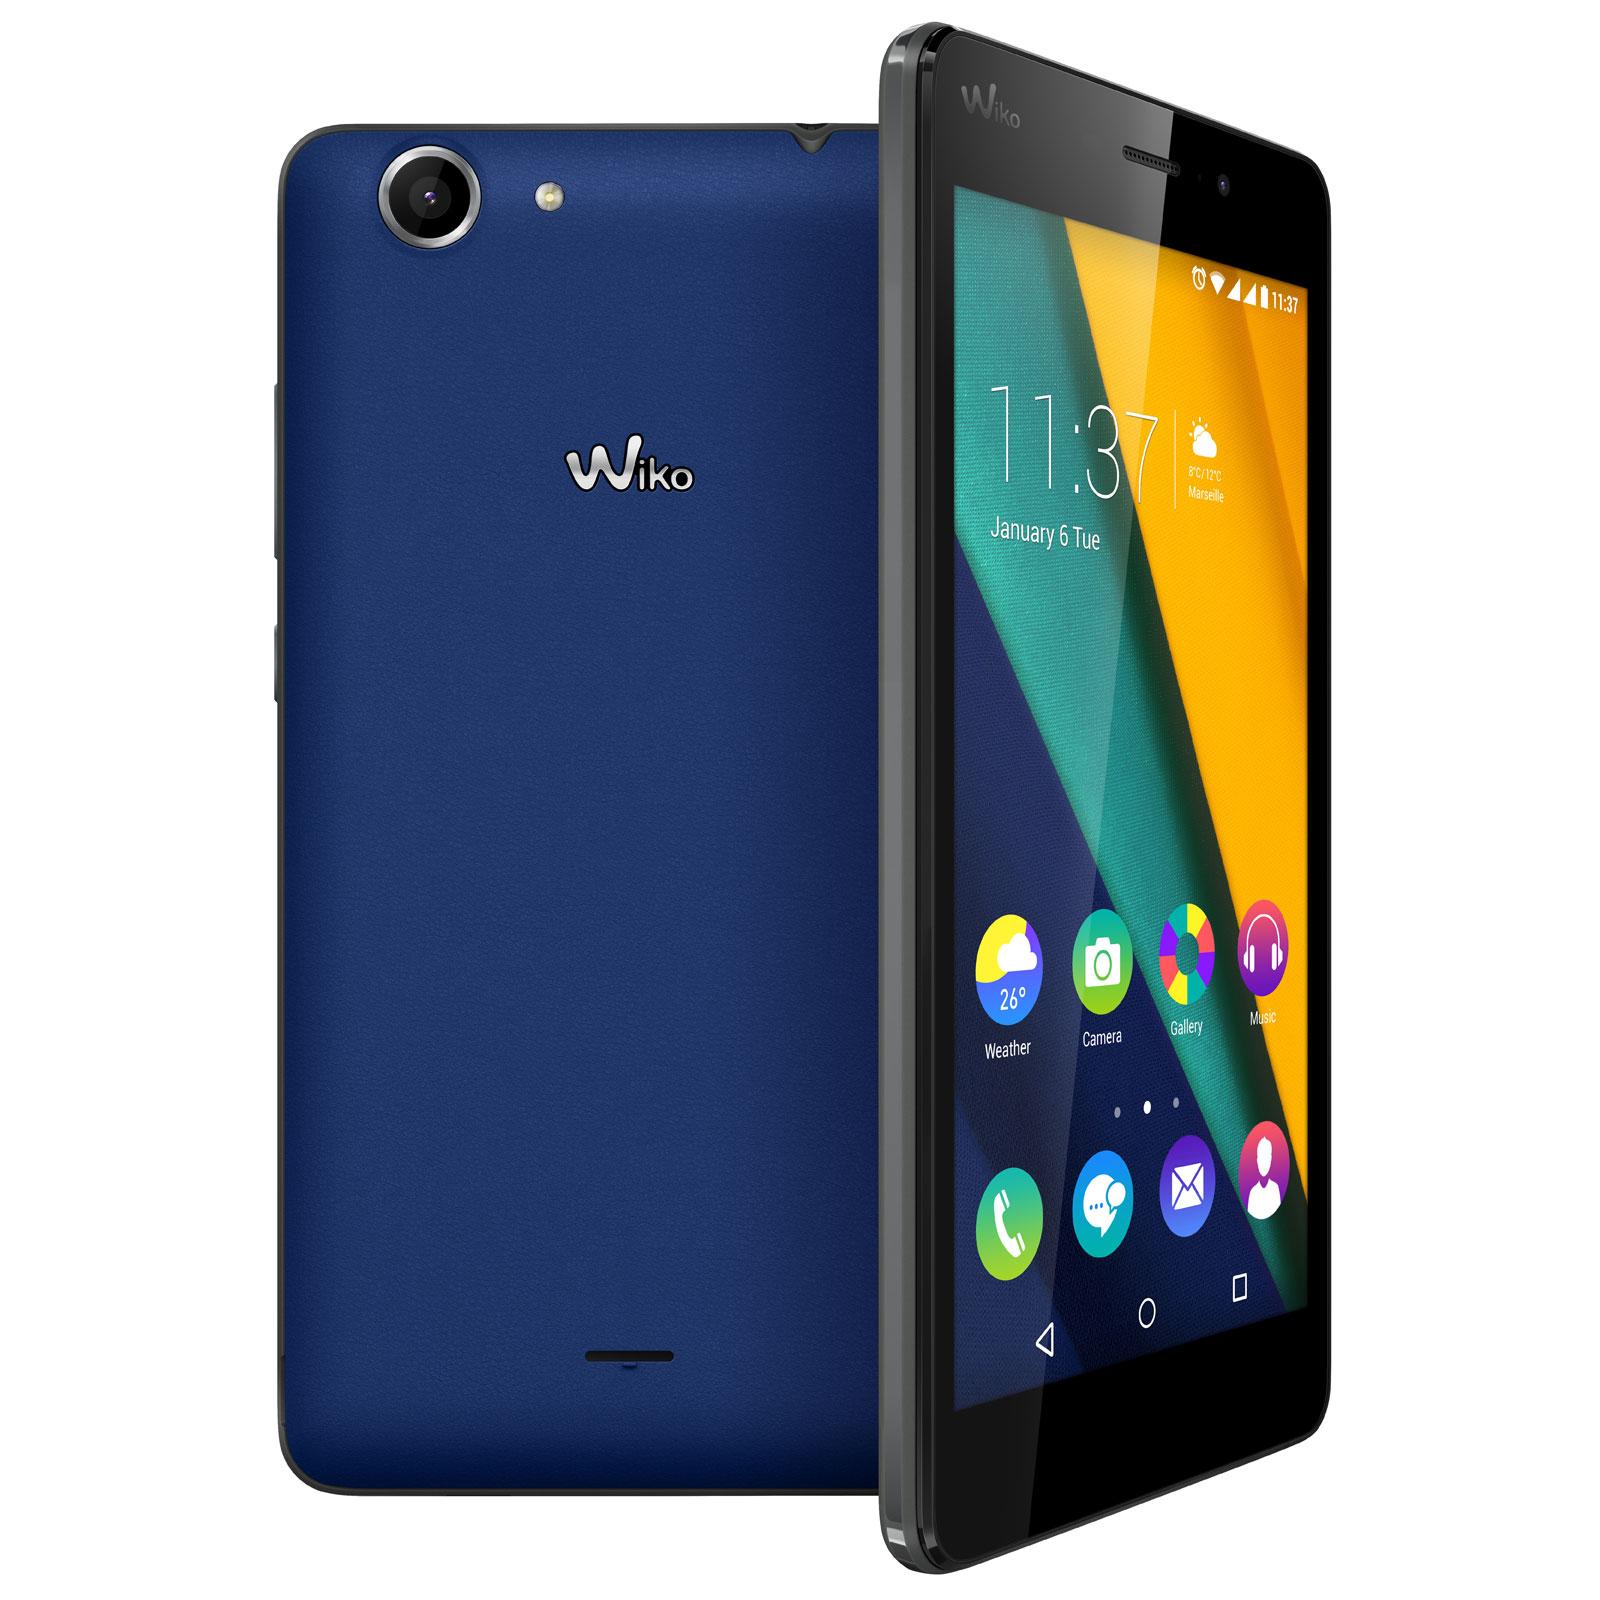 Wiko pulp fab 4g bleu mobile smartphone wiko sur for Photo ecran wiko pulp